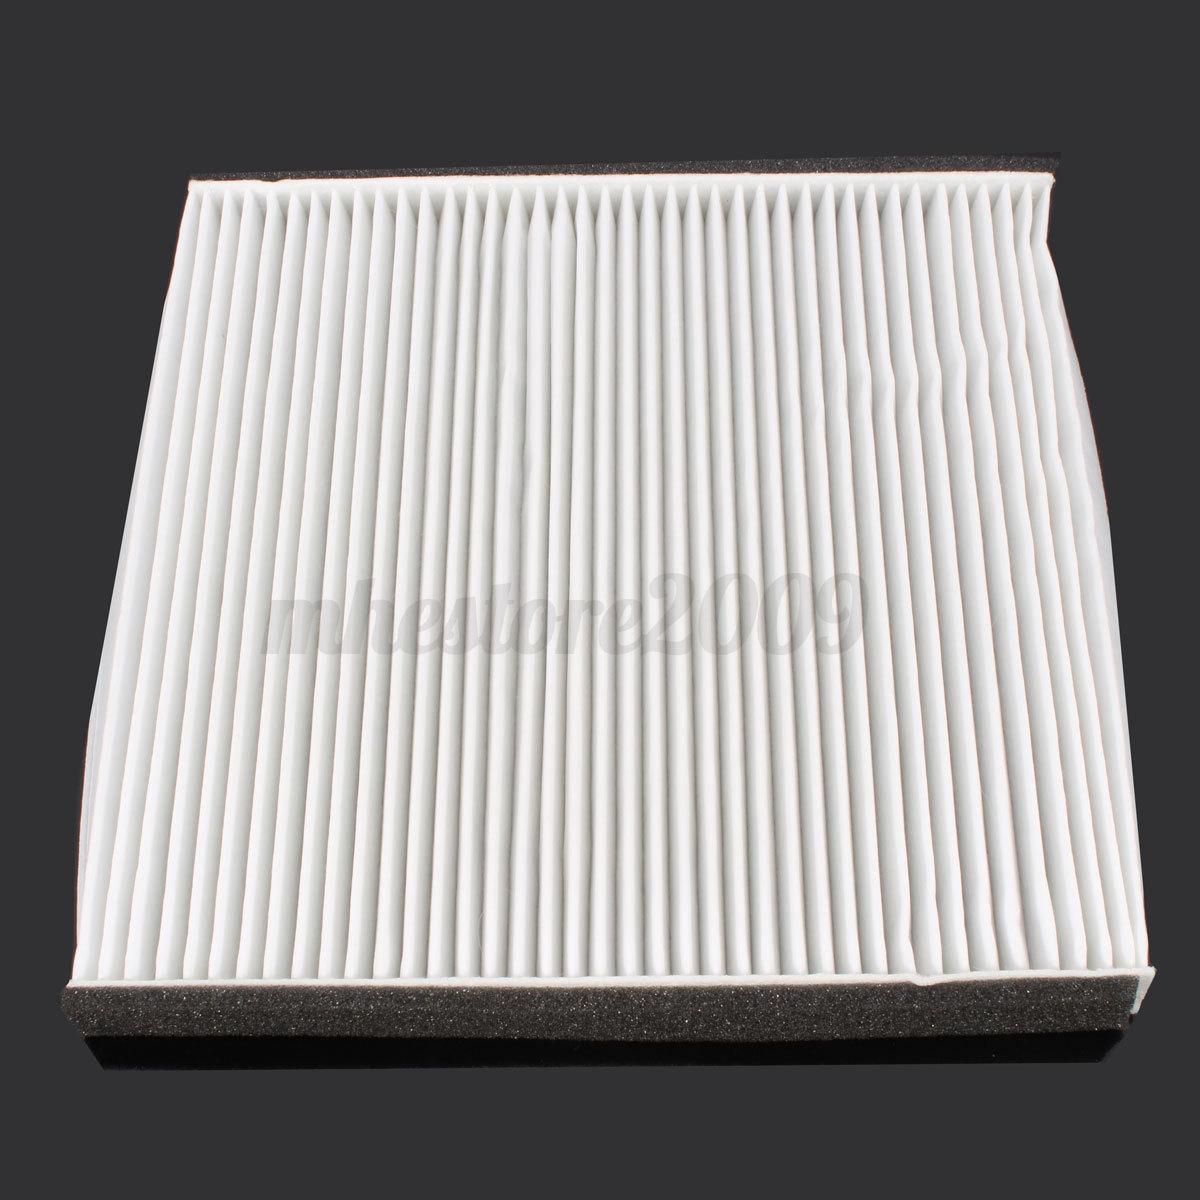 2009 toyota camry cabin air filter ebay. Black Bedroom Furniture Sets. Home Design Ideas